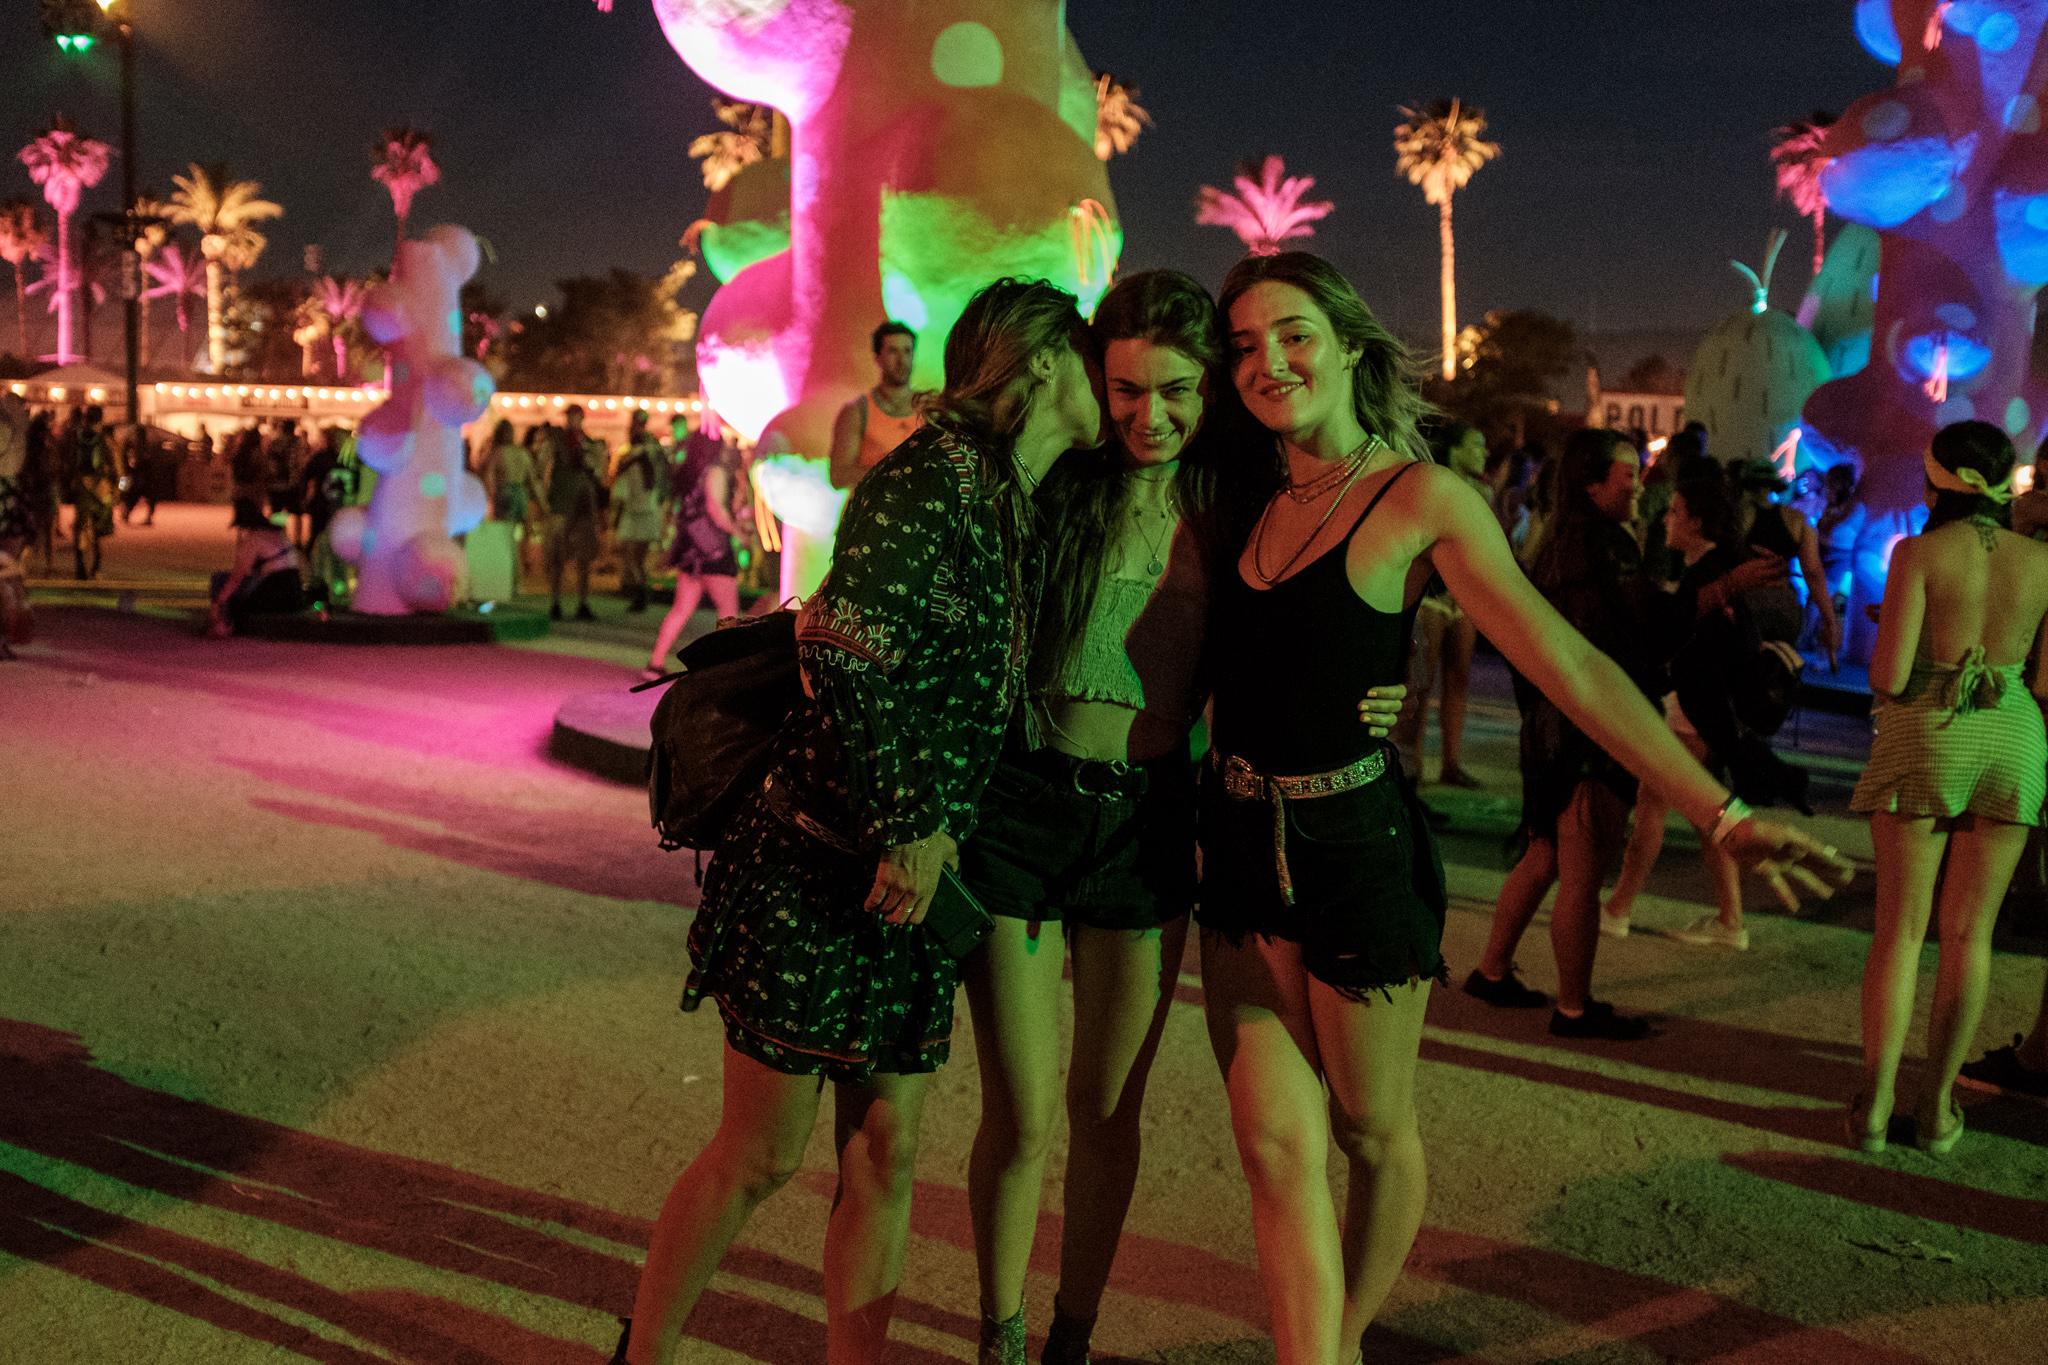 170423 Coachella 17 w2 2157.jpg